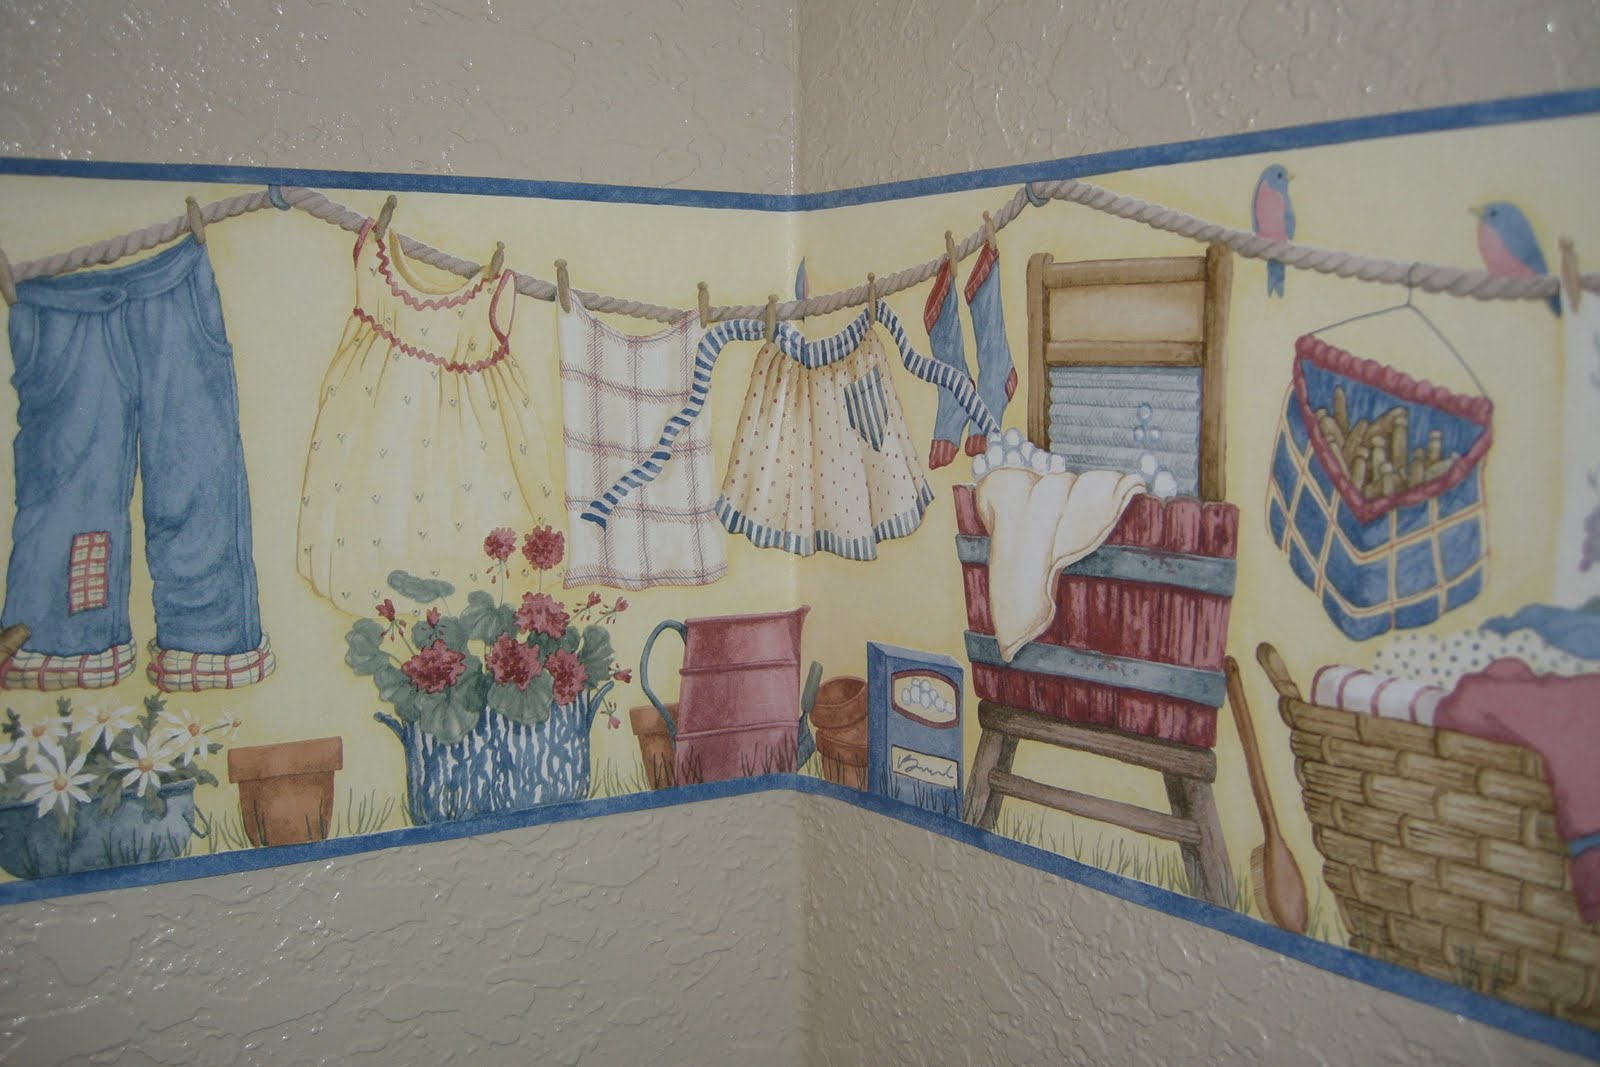 laundry room vintage wallpaper border - photo #21